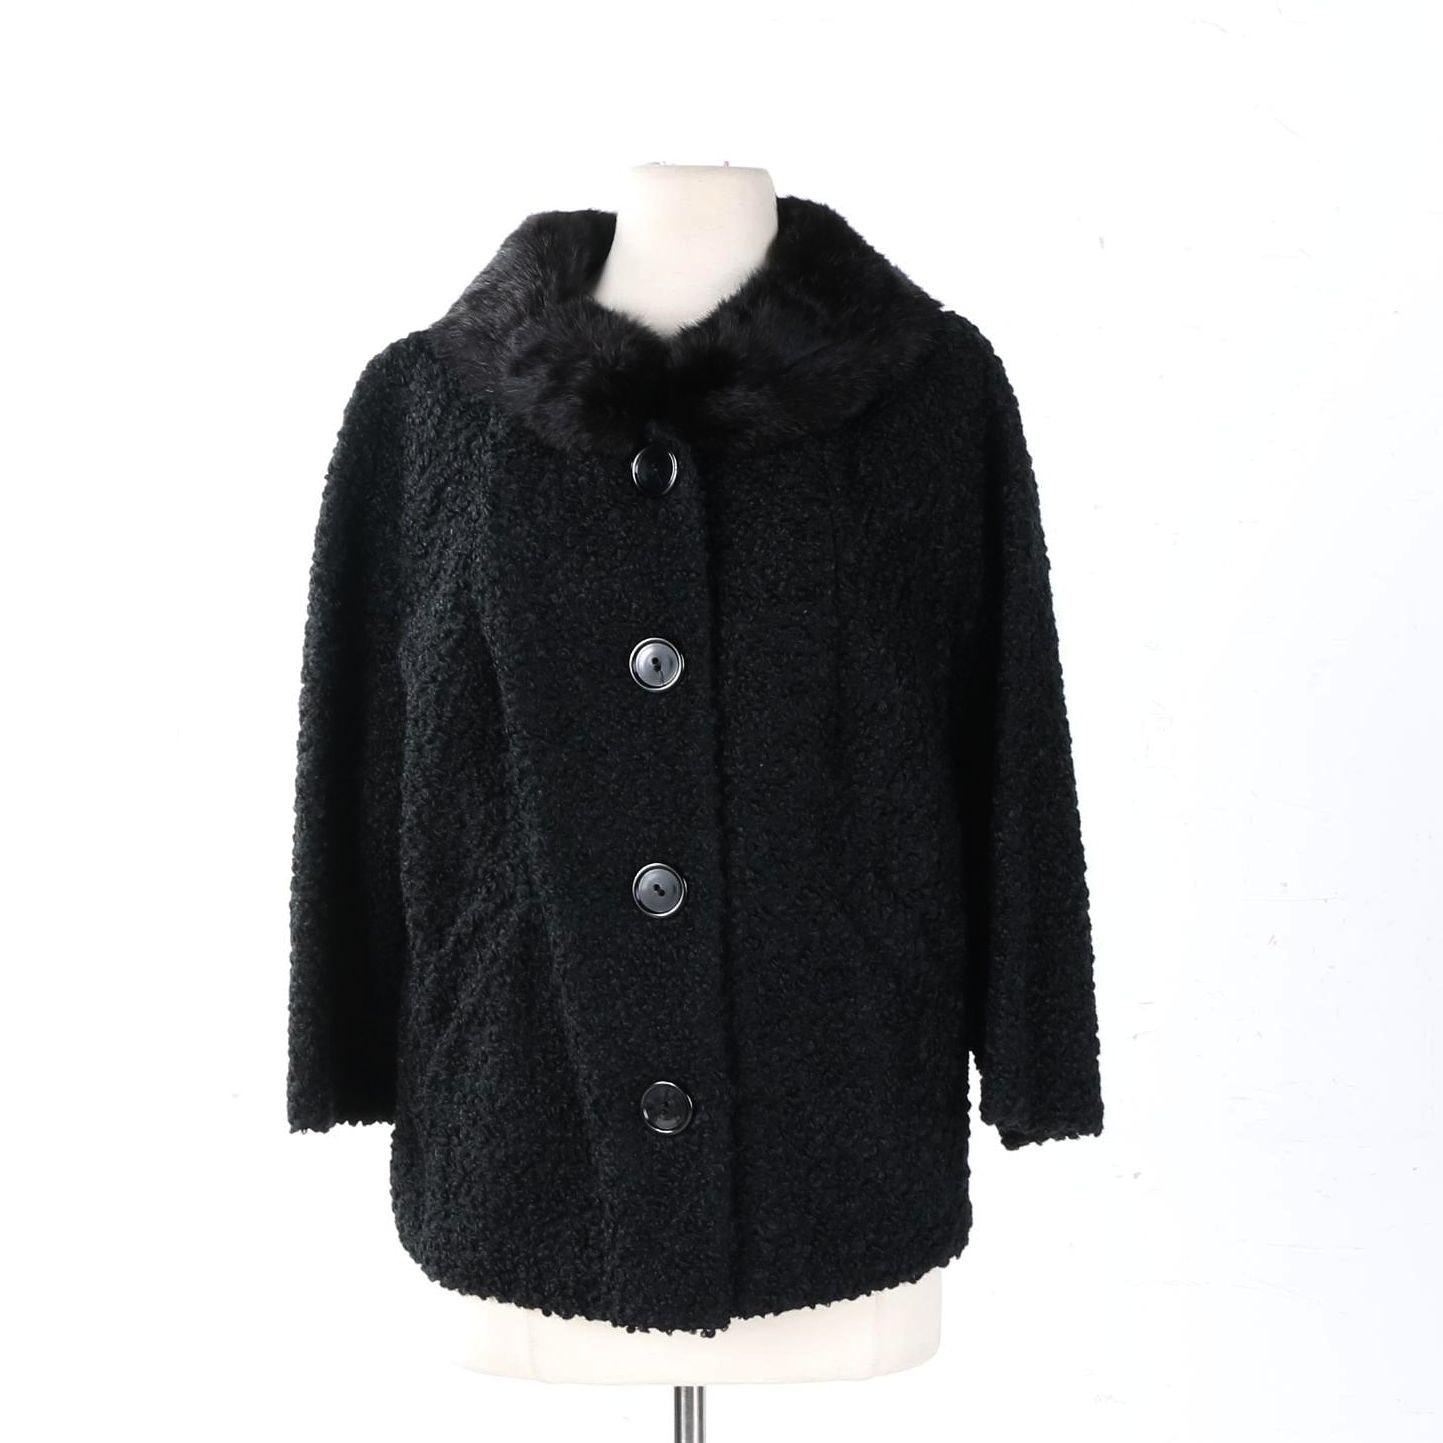 Vintage Persian Lamb Coat with Rabbit Fur Collar